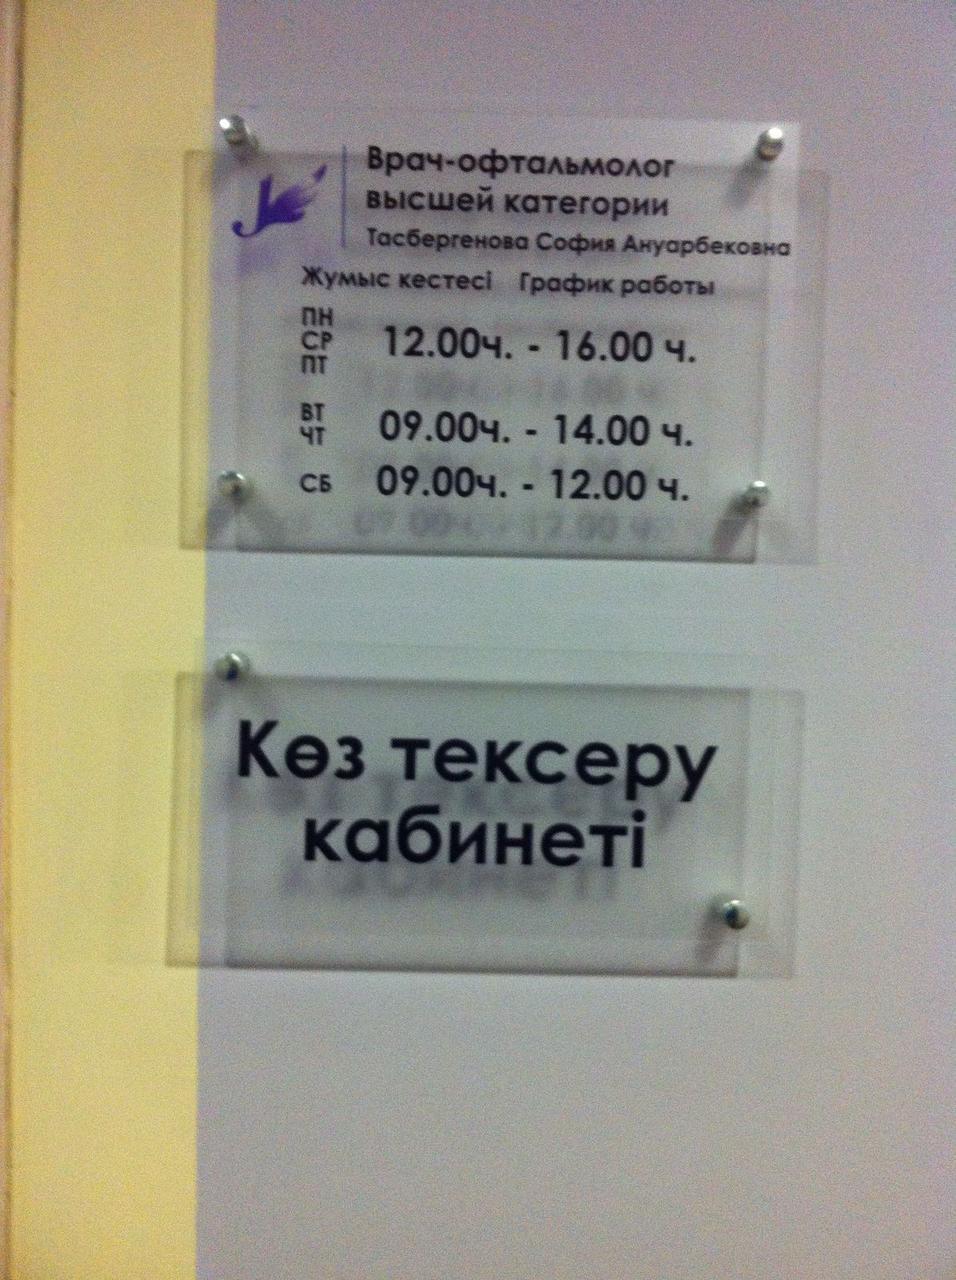 Таблички для офиса